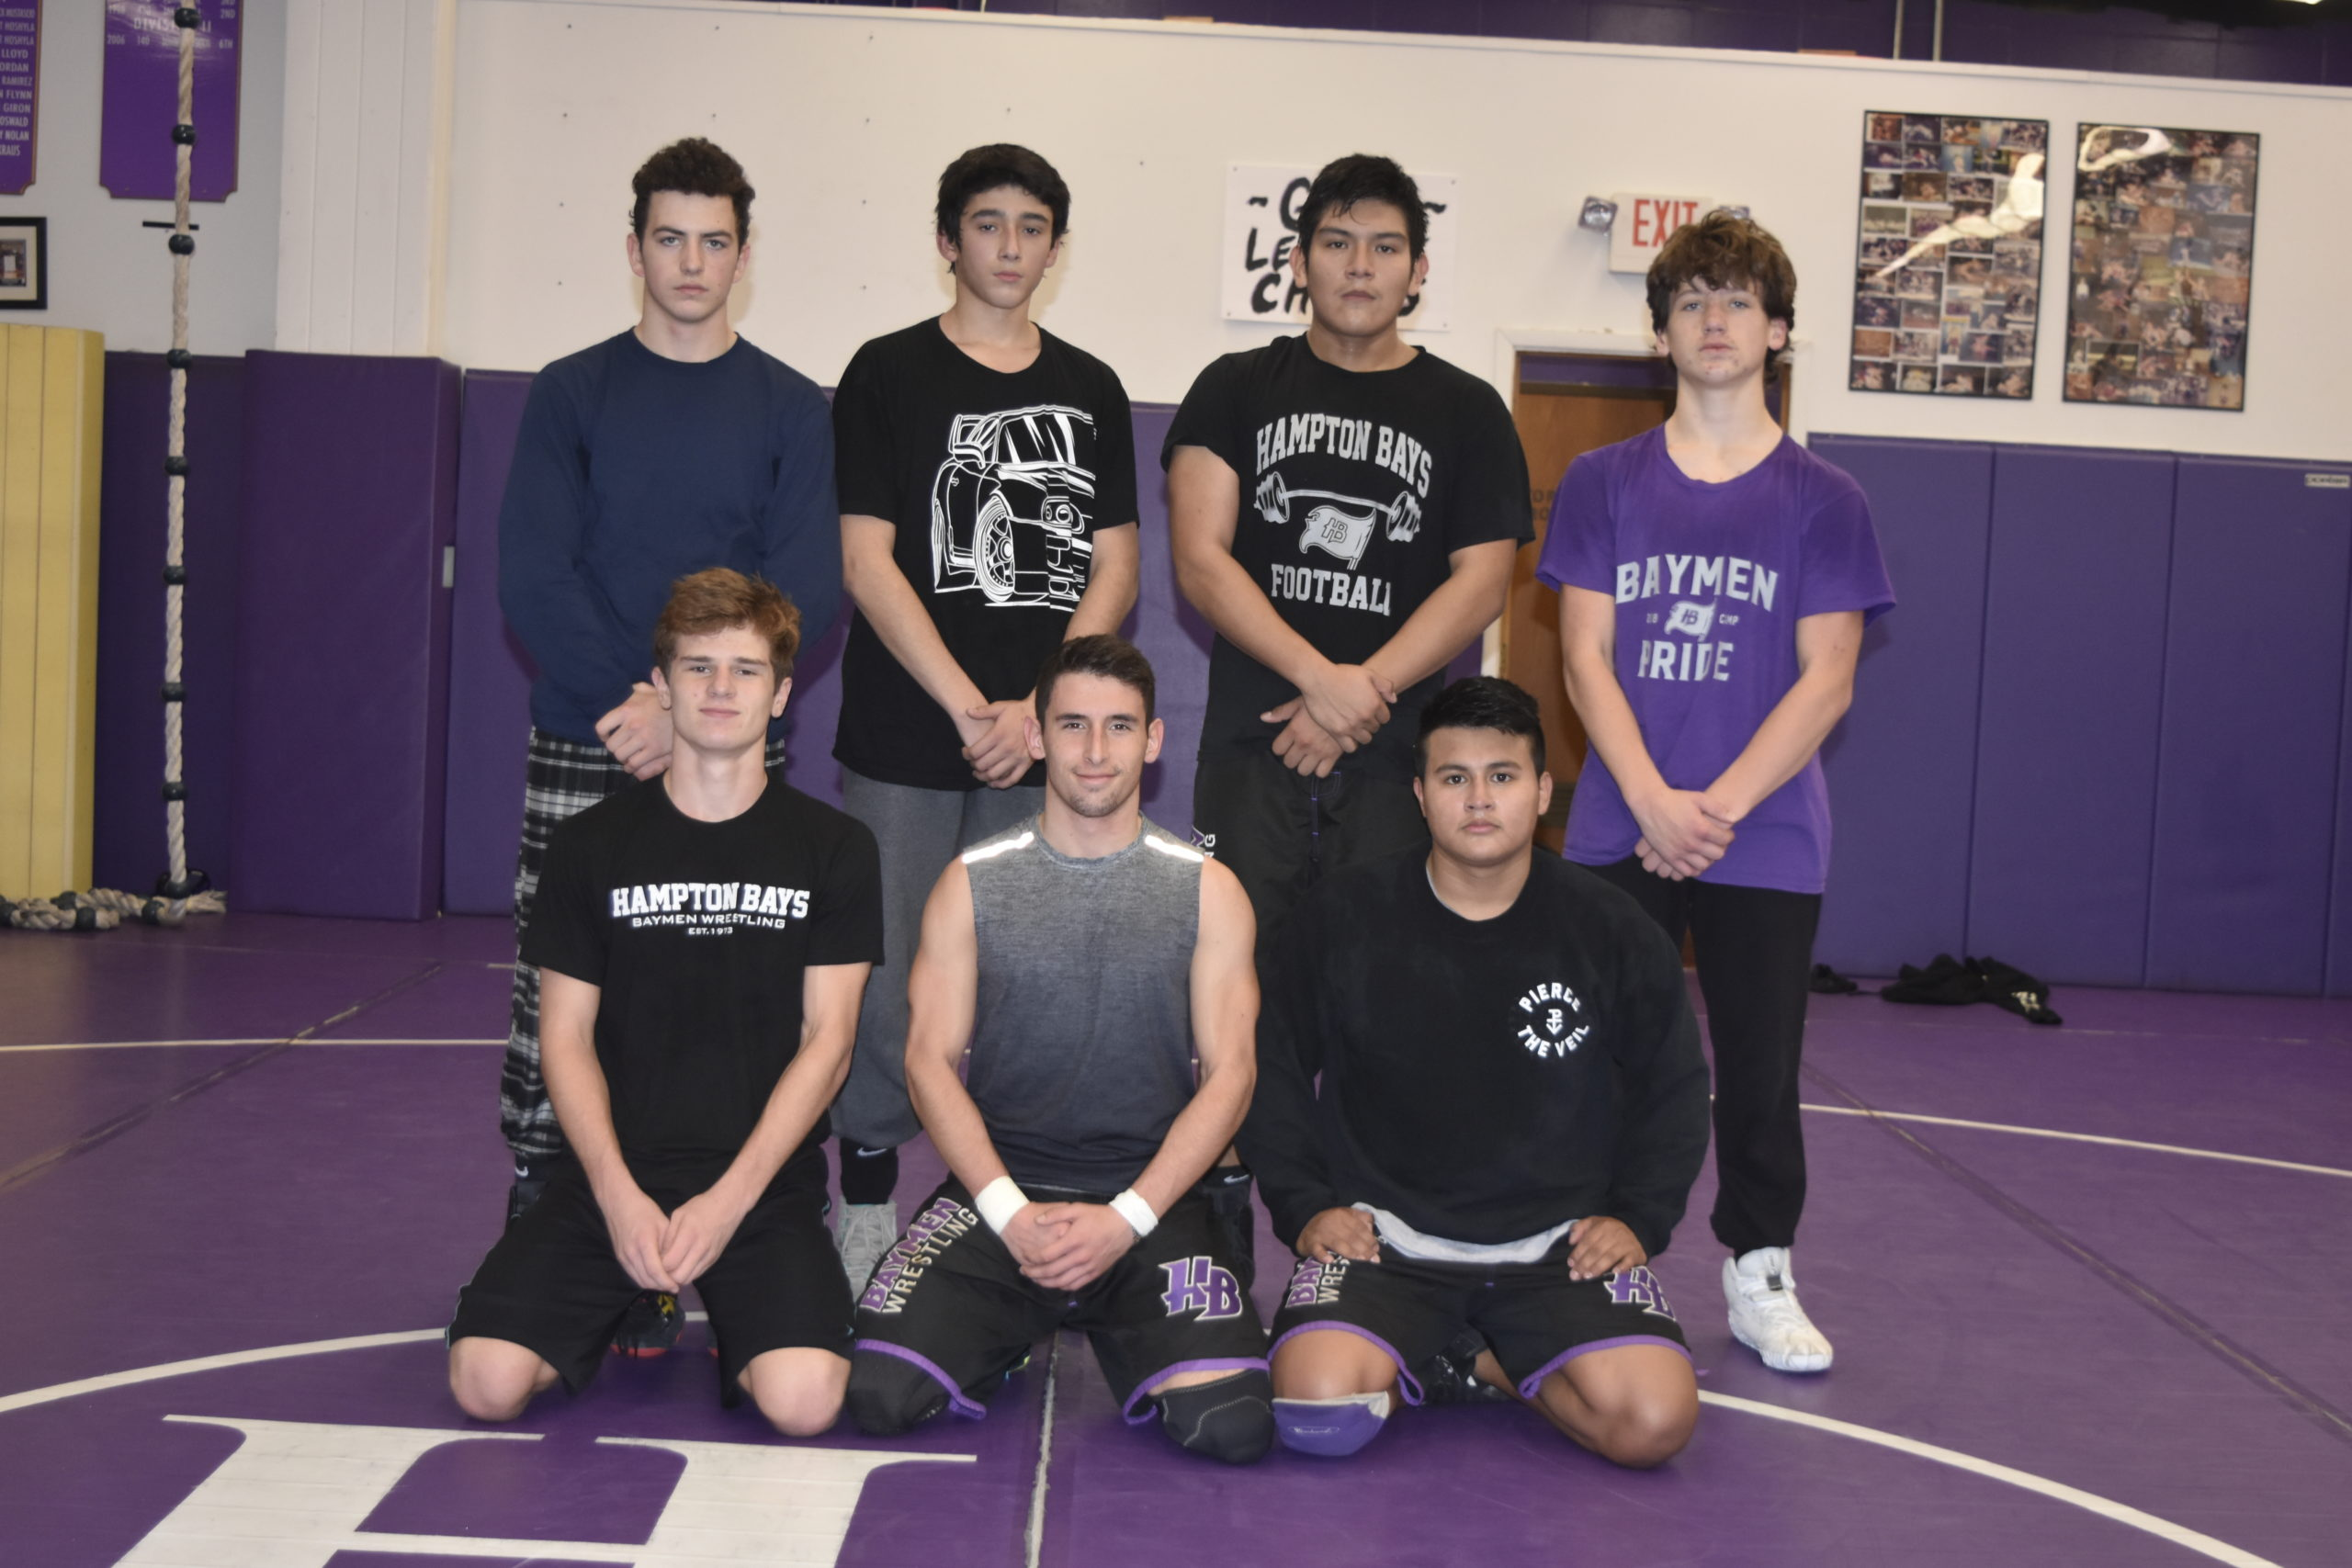 Some returning Baymen wrestlers this season include, from top left, Logan Grismer, Sebastian Valenzia, Erubiel Ramos, from bottom left, River Orlando, Nick Pacheco and Alex Velasquez.